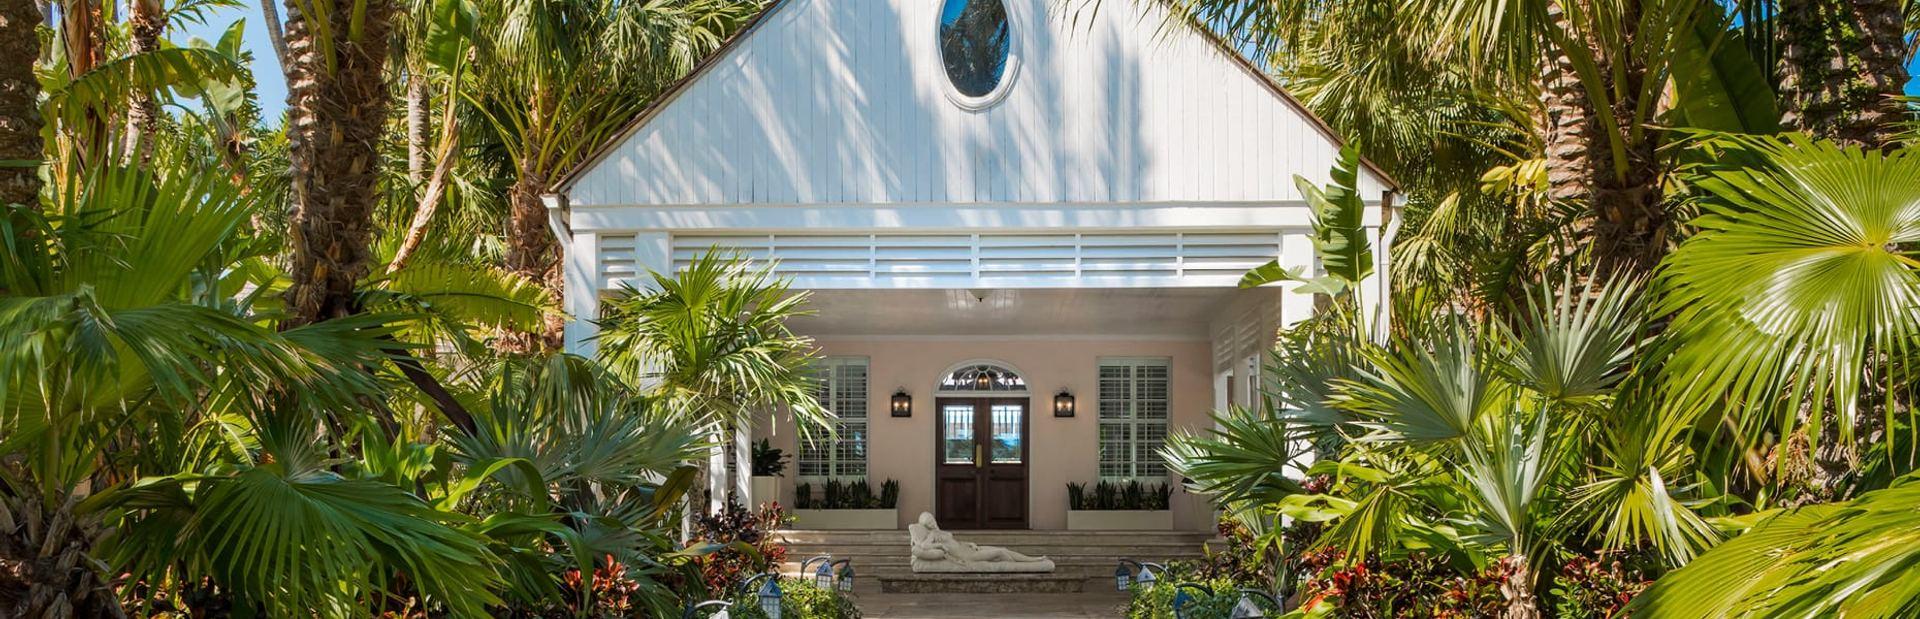 The Ocean Club Spa Image 1